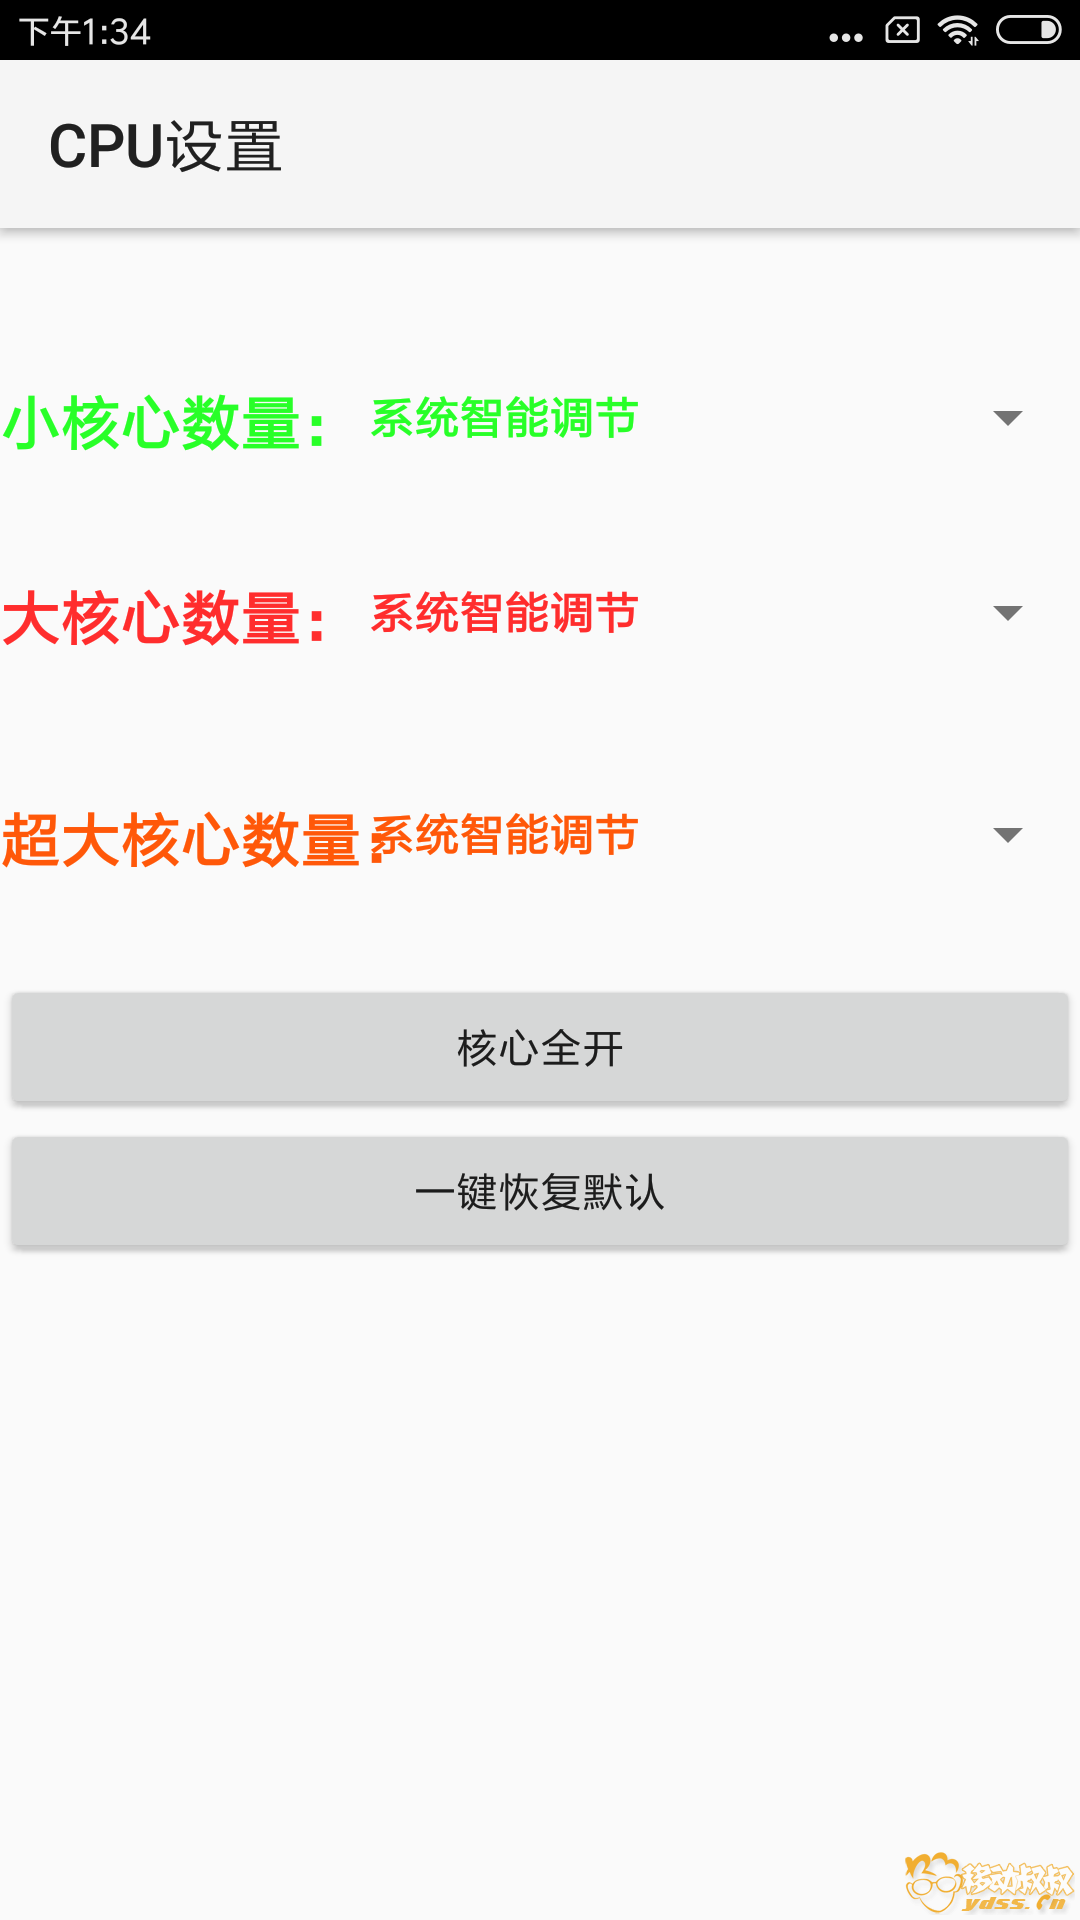 Screenshot_2018-06-14-13-34-02-996_com.eui.xd.png